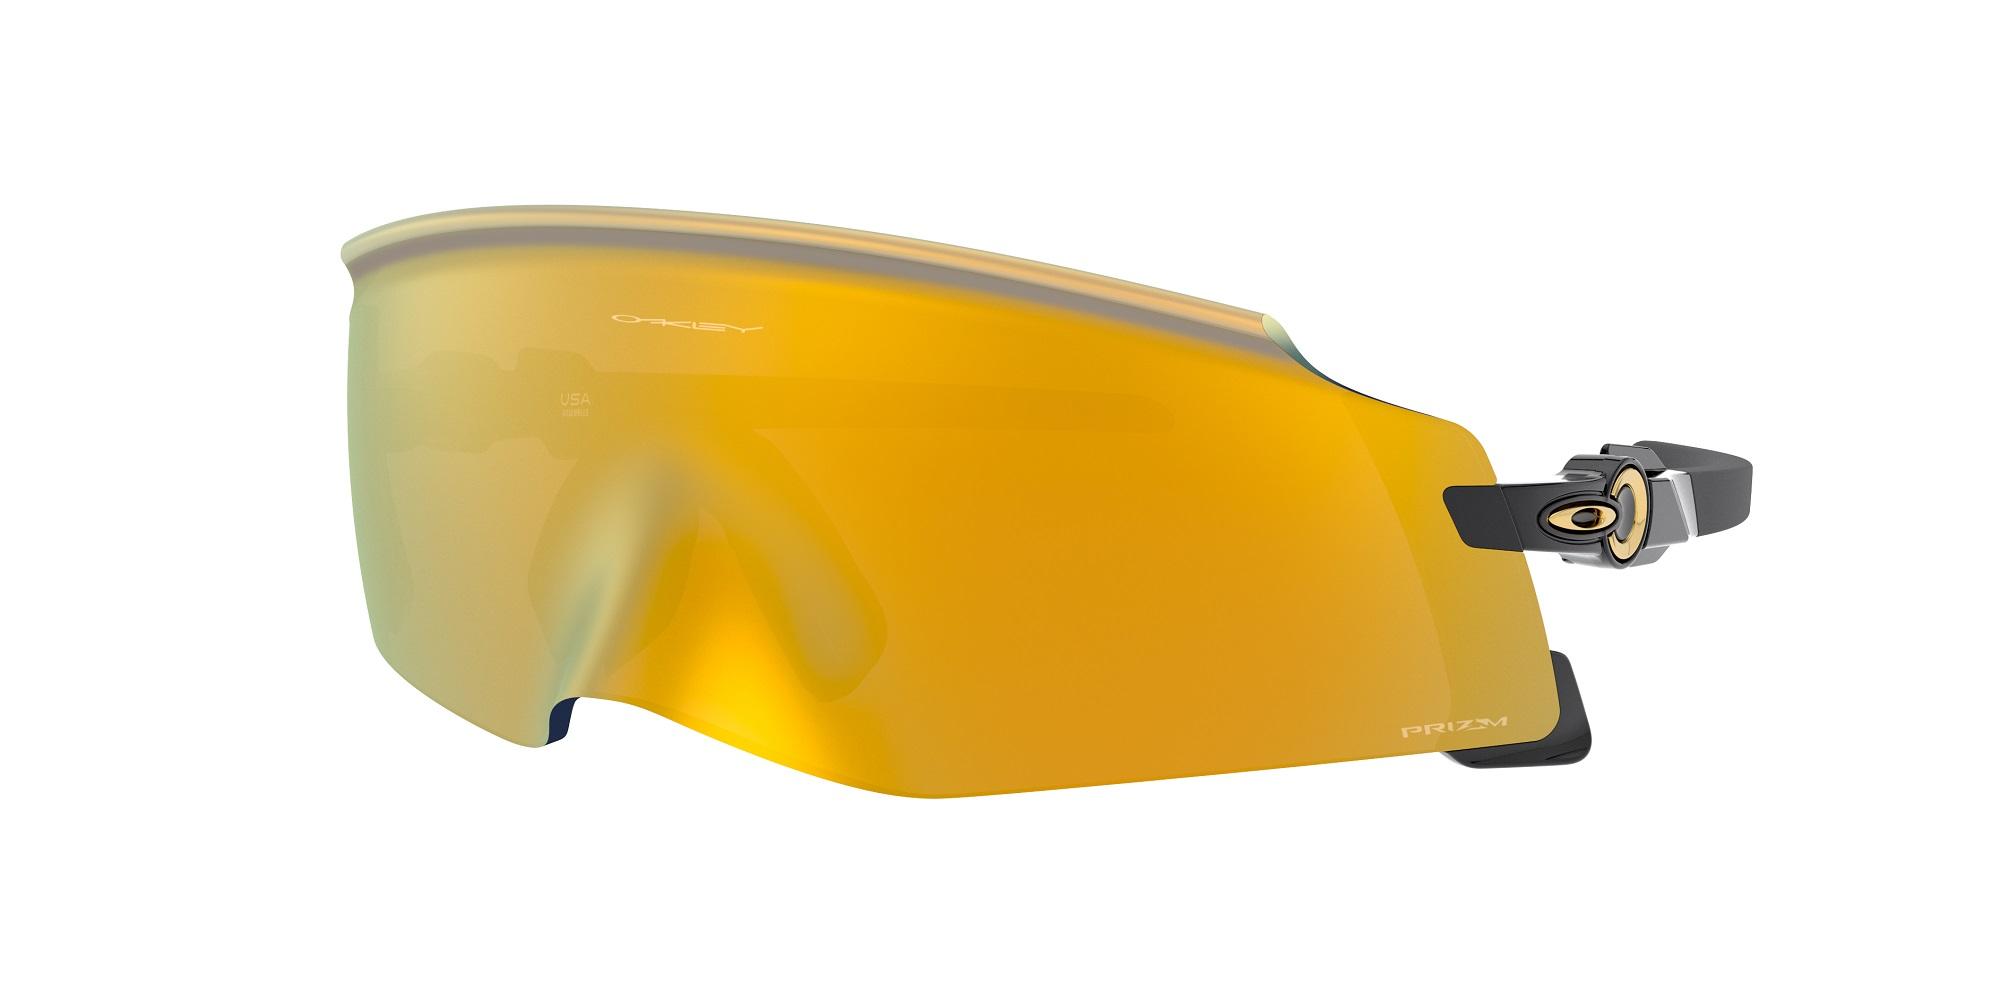 Oakley gold kato sunglasses